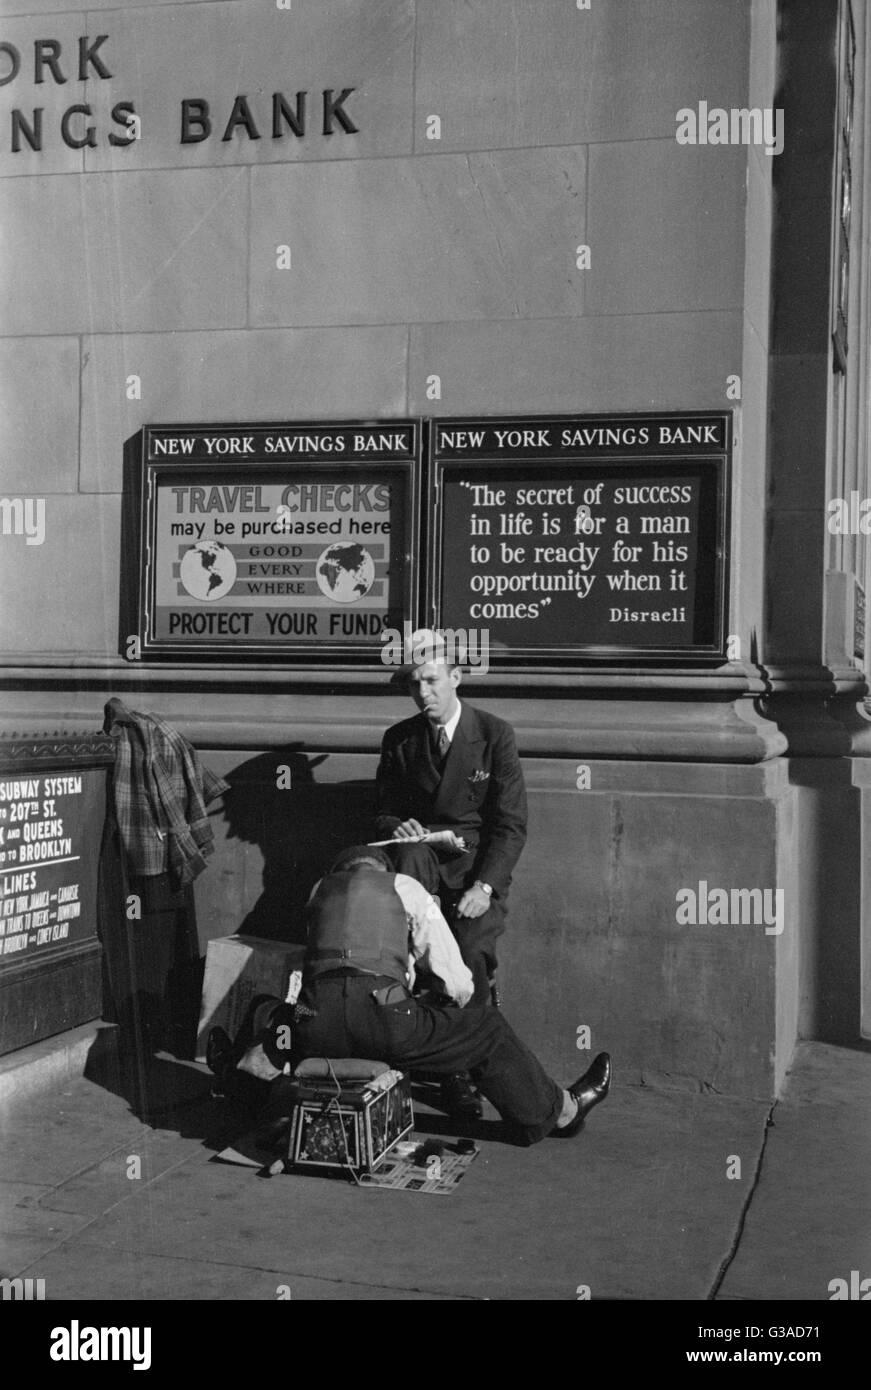 Bootblack, Fourteenth Street and Eighth Avenue, New York, New York. Date 1937 Dec. - Stock Image